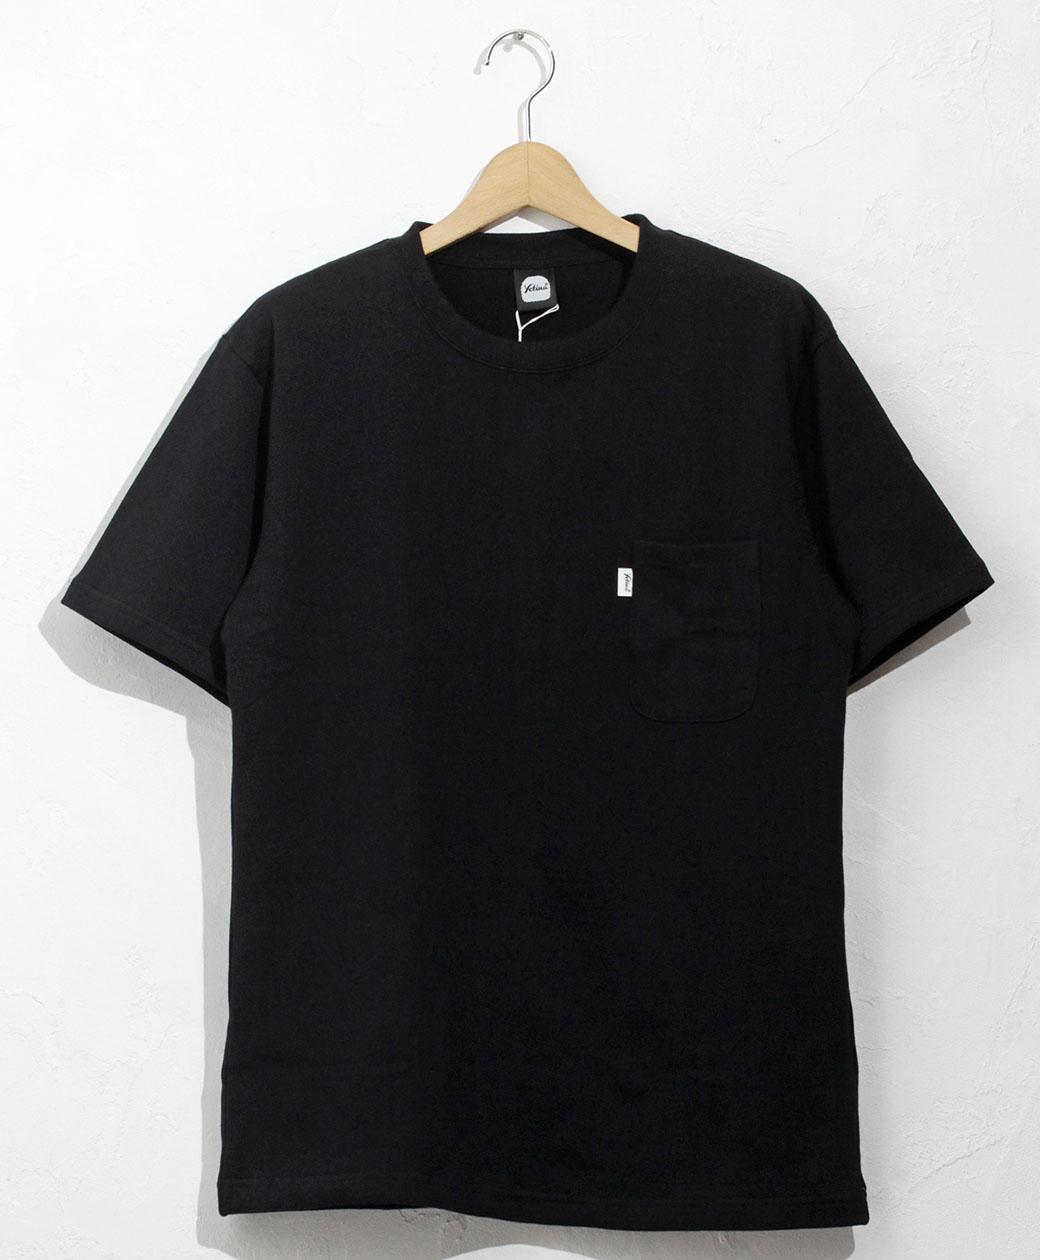 yetina heavy weight cotton pocket T-shirt(black)